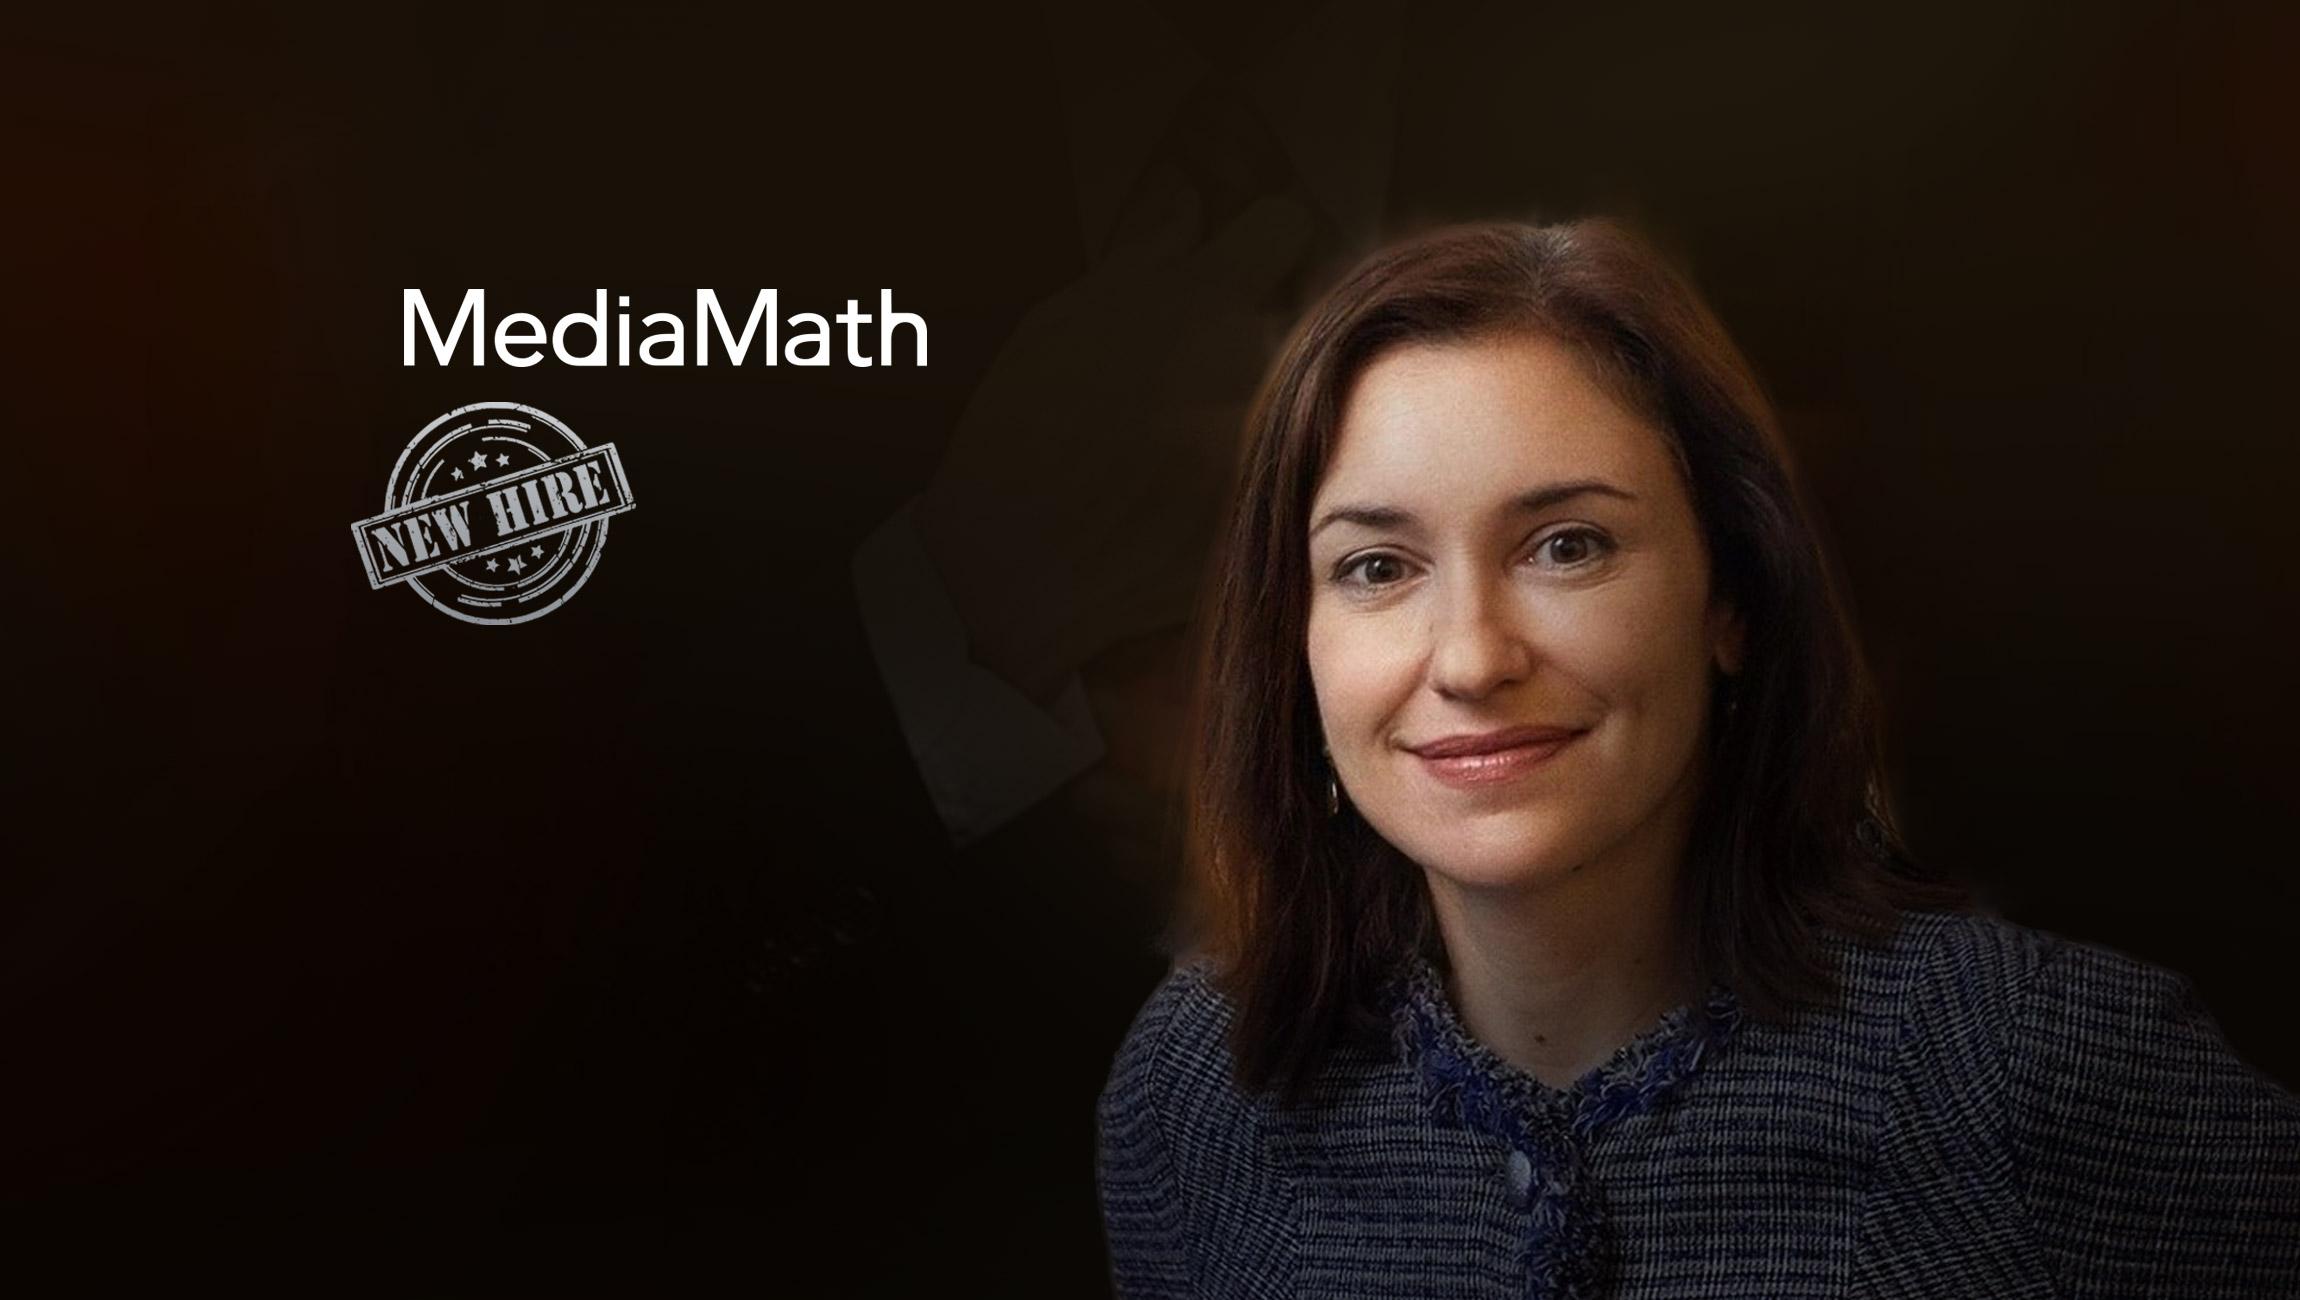 MediaMath Bolsters Leadership with Appointment of CFO, Milena Alberti-Perez